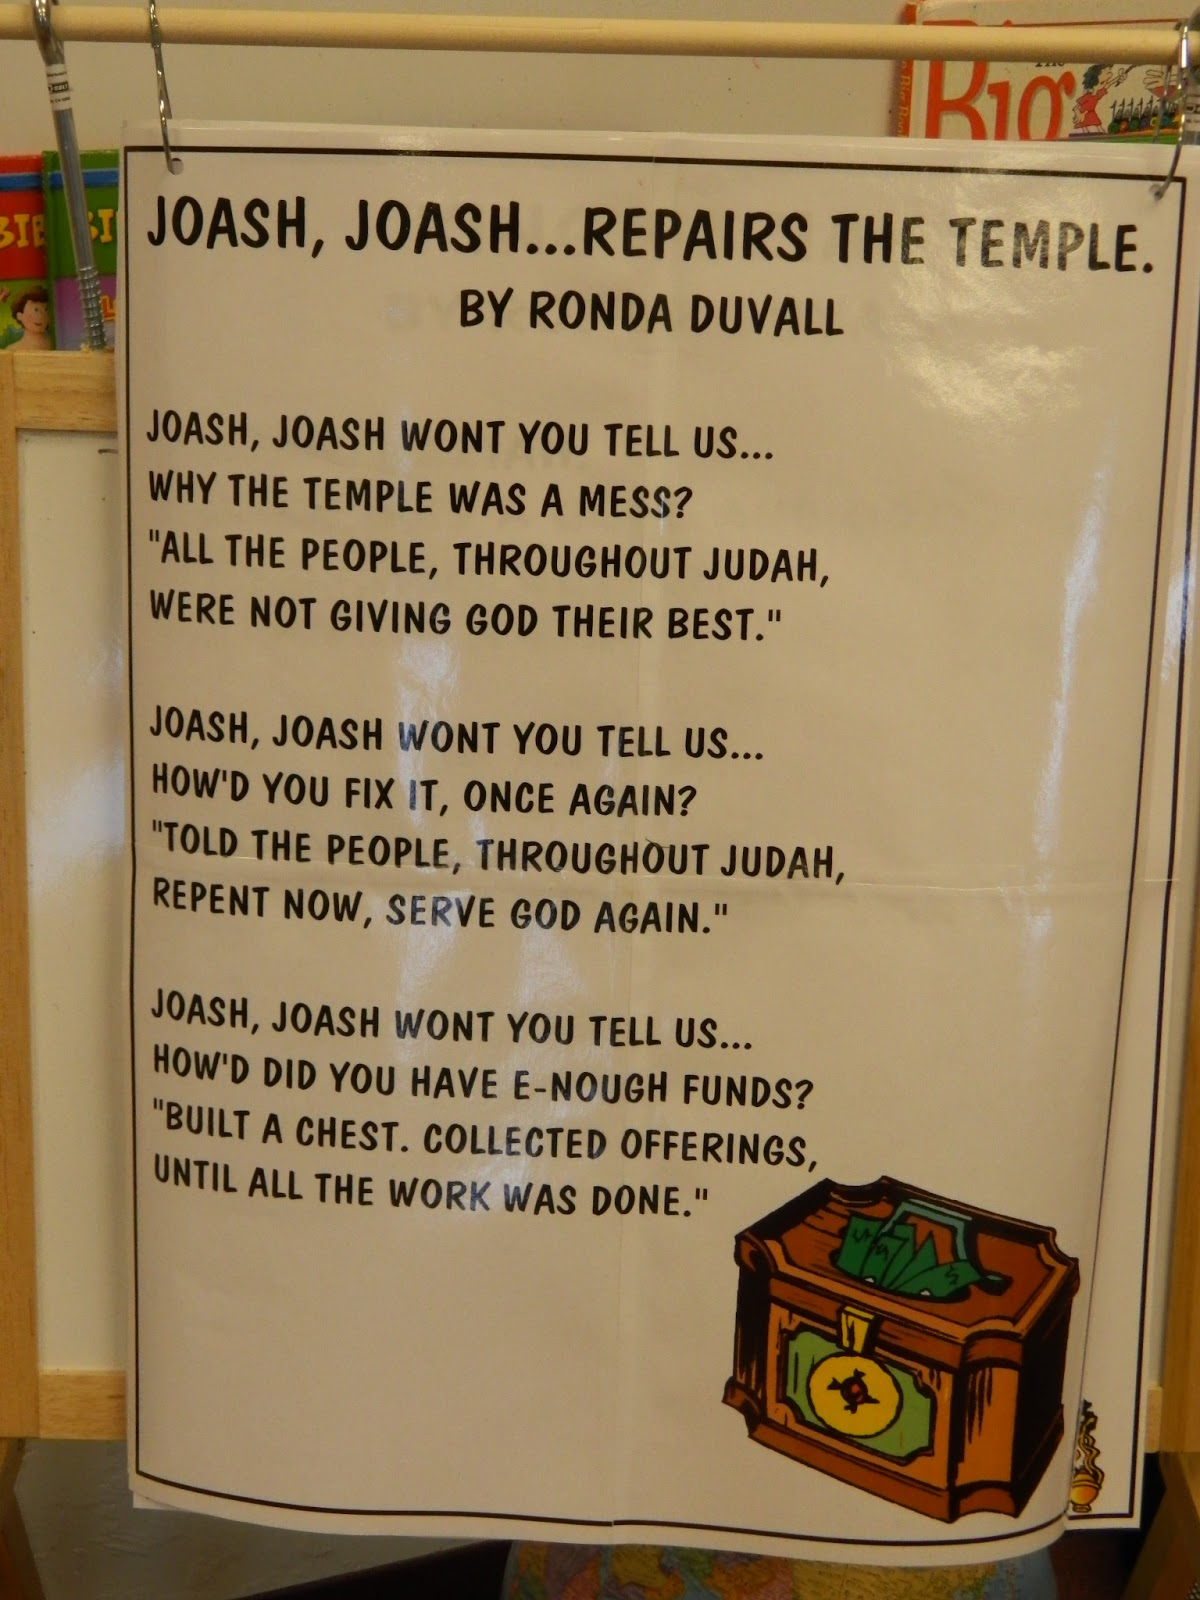 Hands On Bible Teacher Joash Repairs The Temple